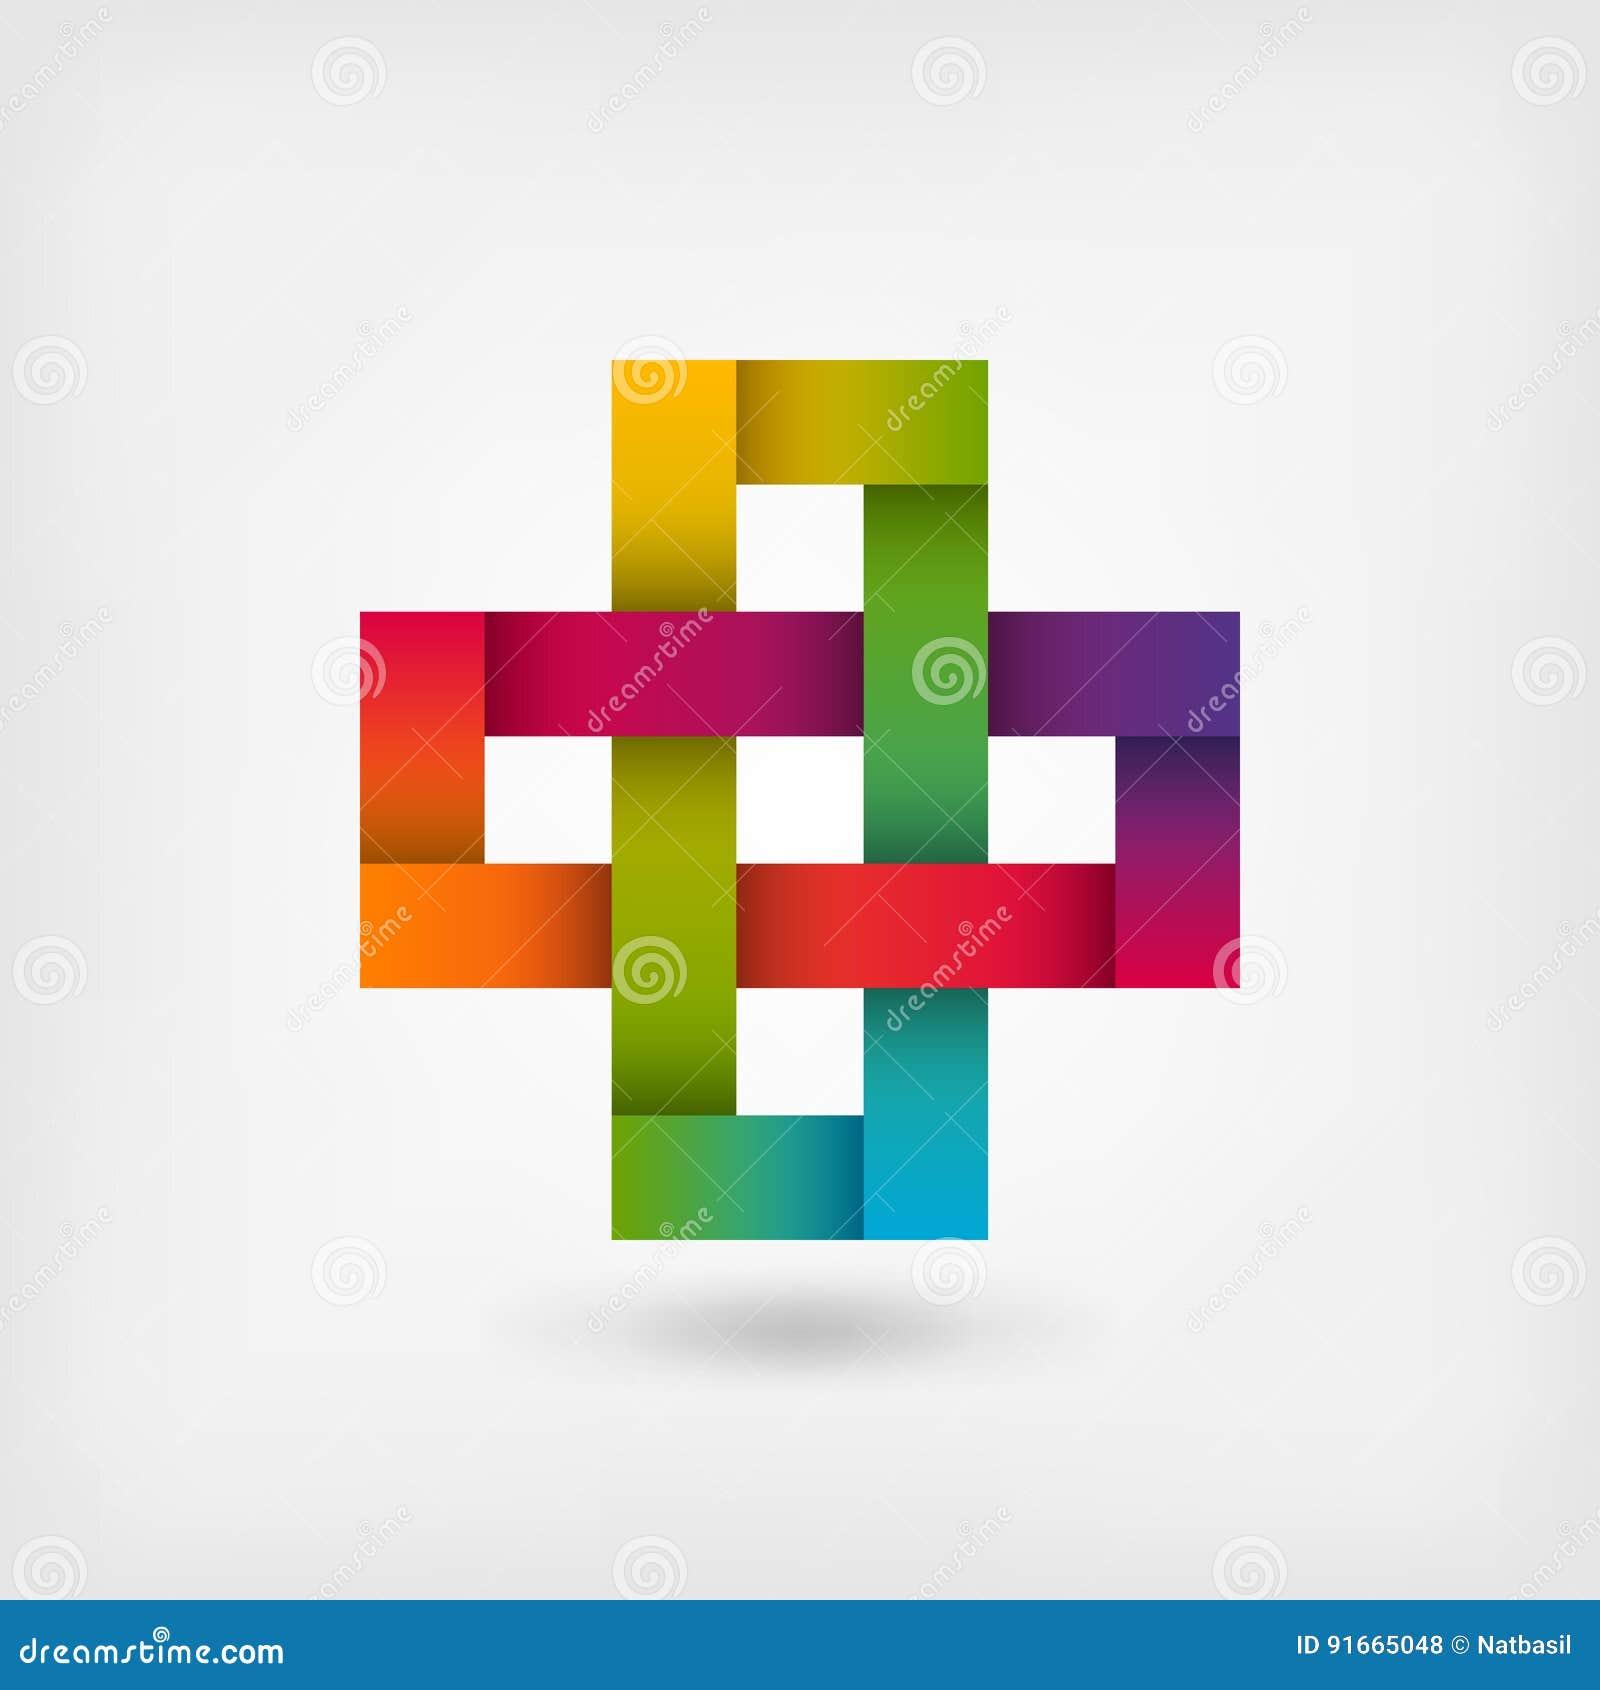 Solomon knot in rainbow colors